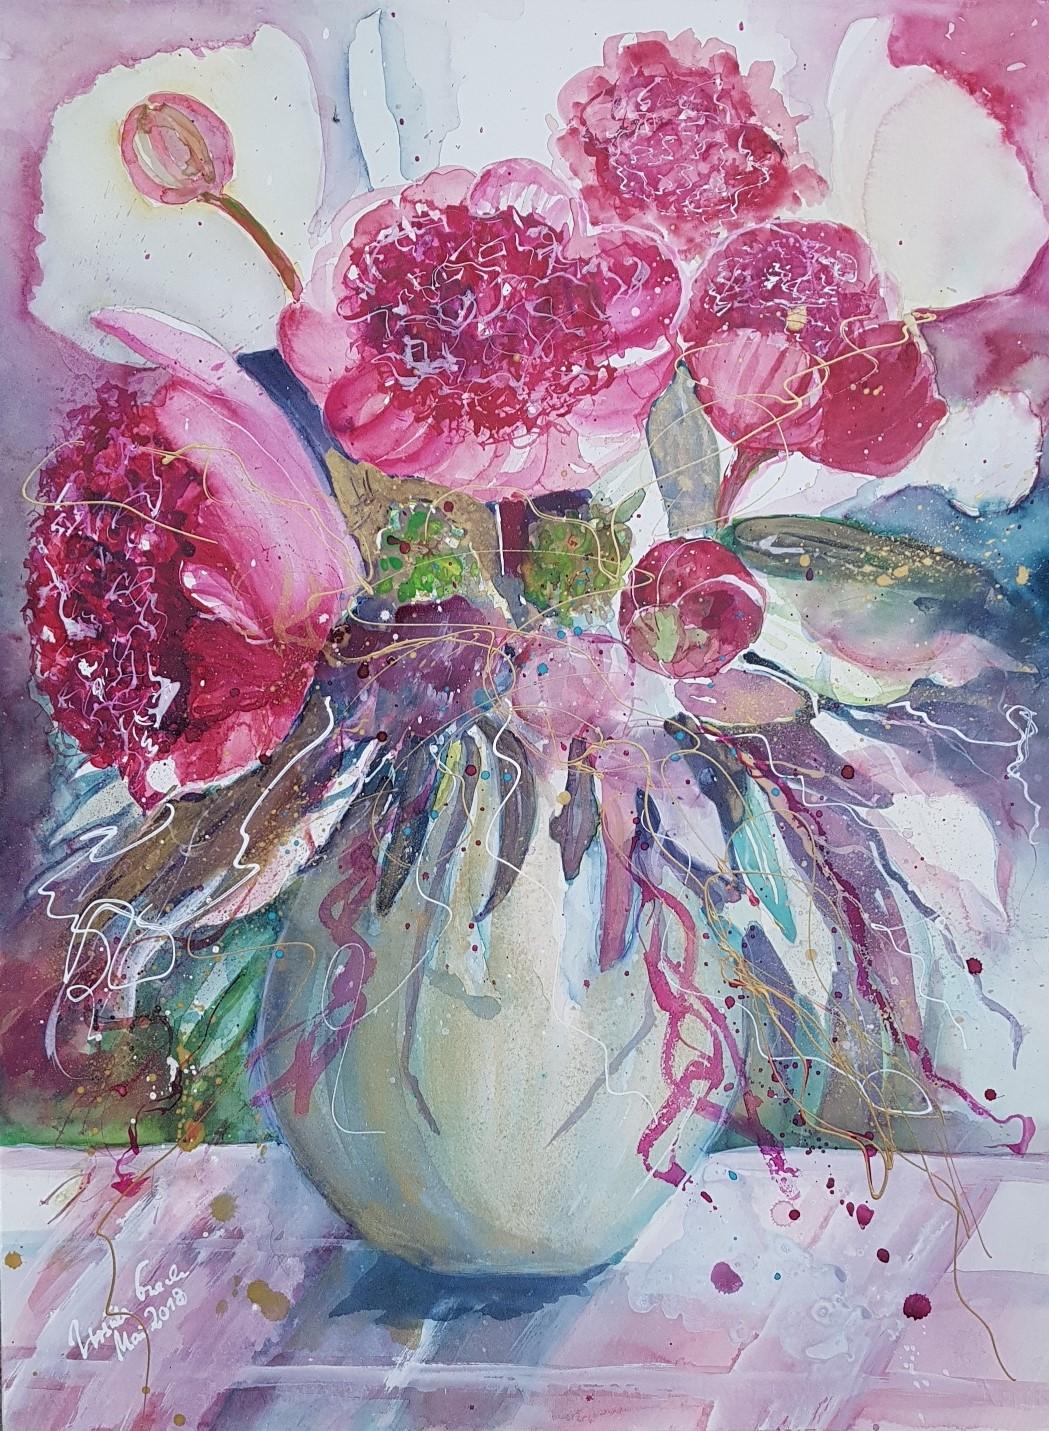 Decoration for you (Technik: Aquarell auf Fabriano 650 g  56 X 76 cm)